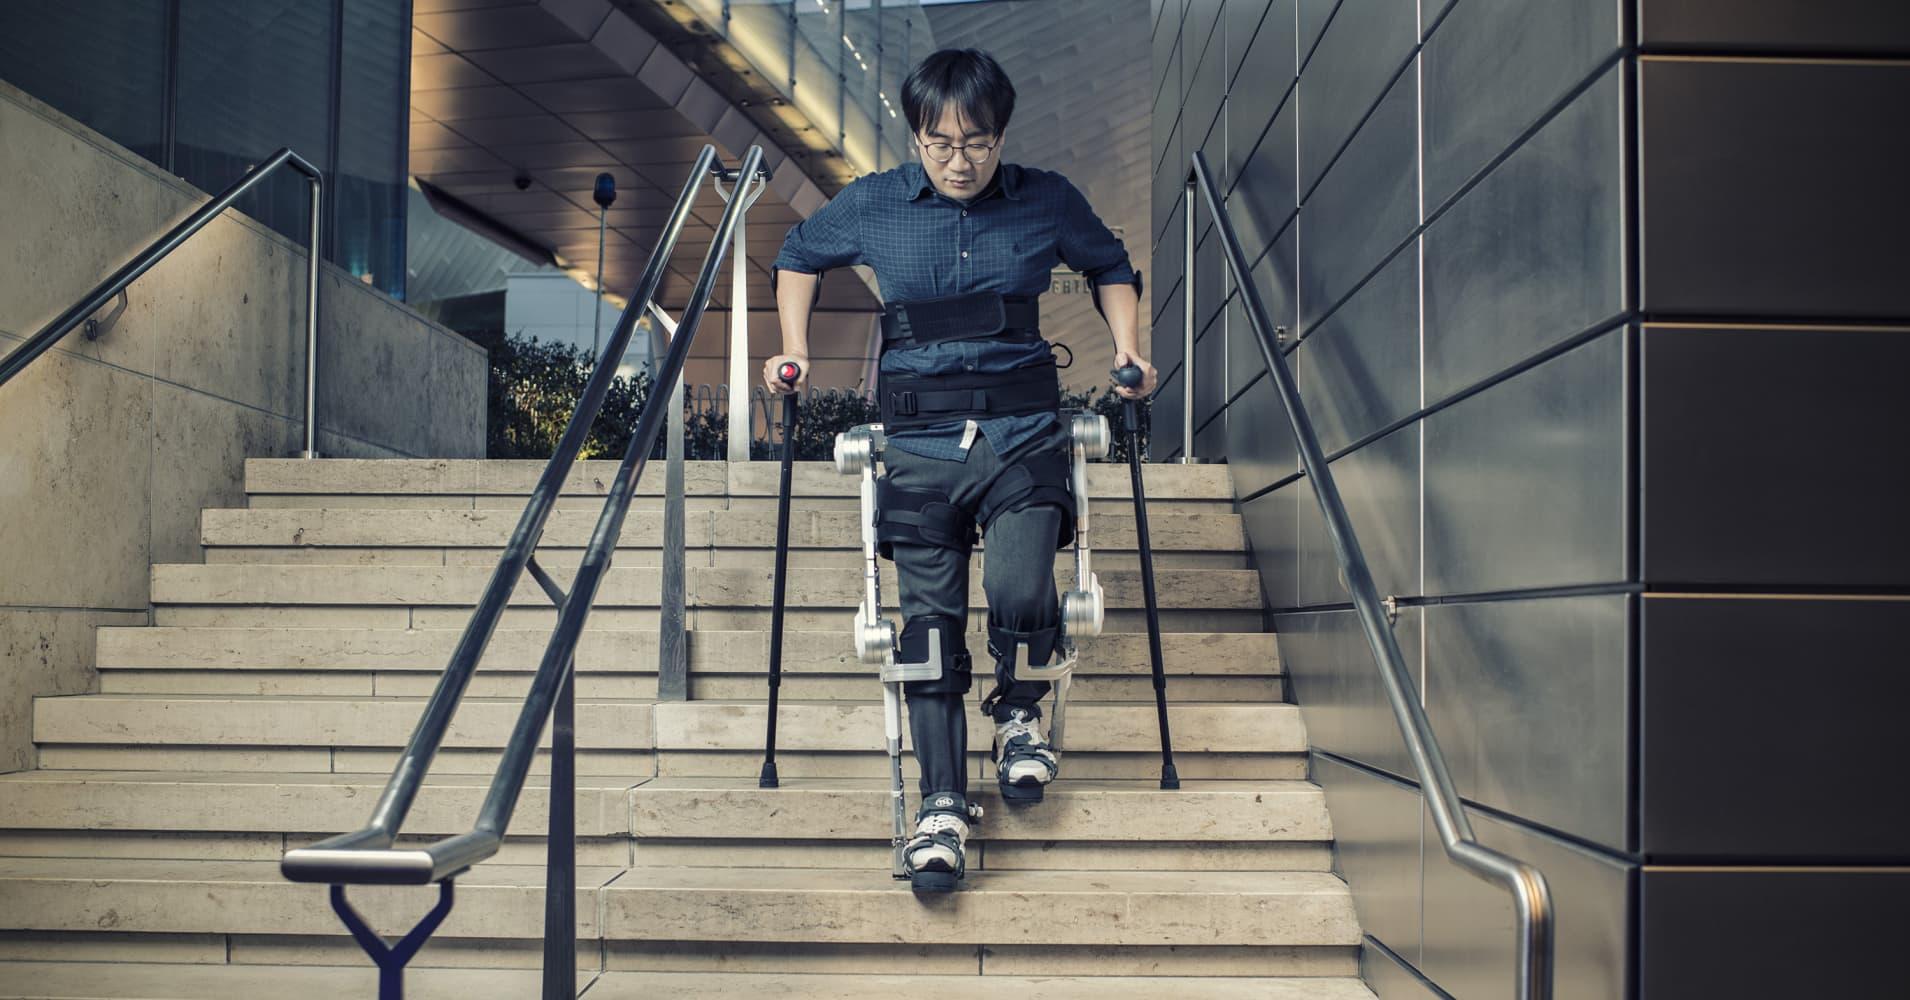 Hyundai debuts a miracle device that can help paraplegics walk